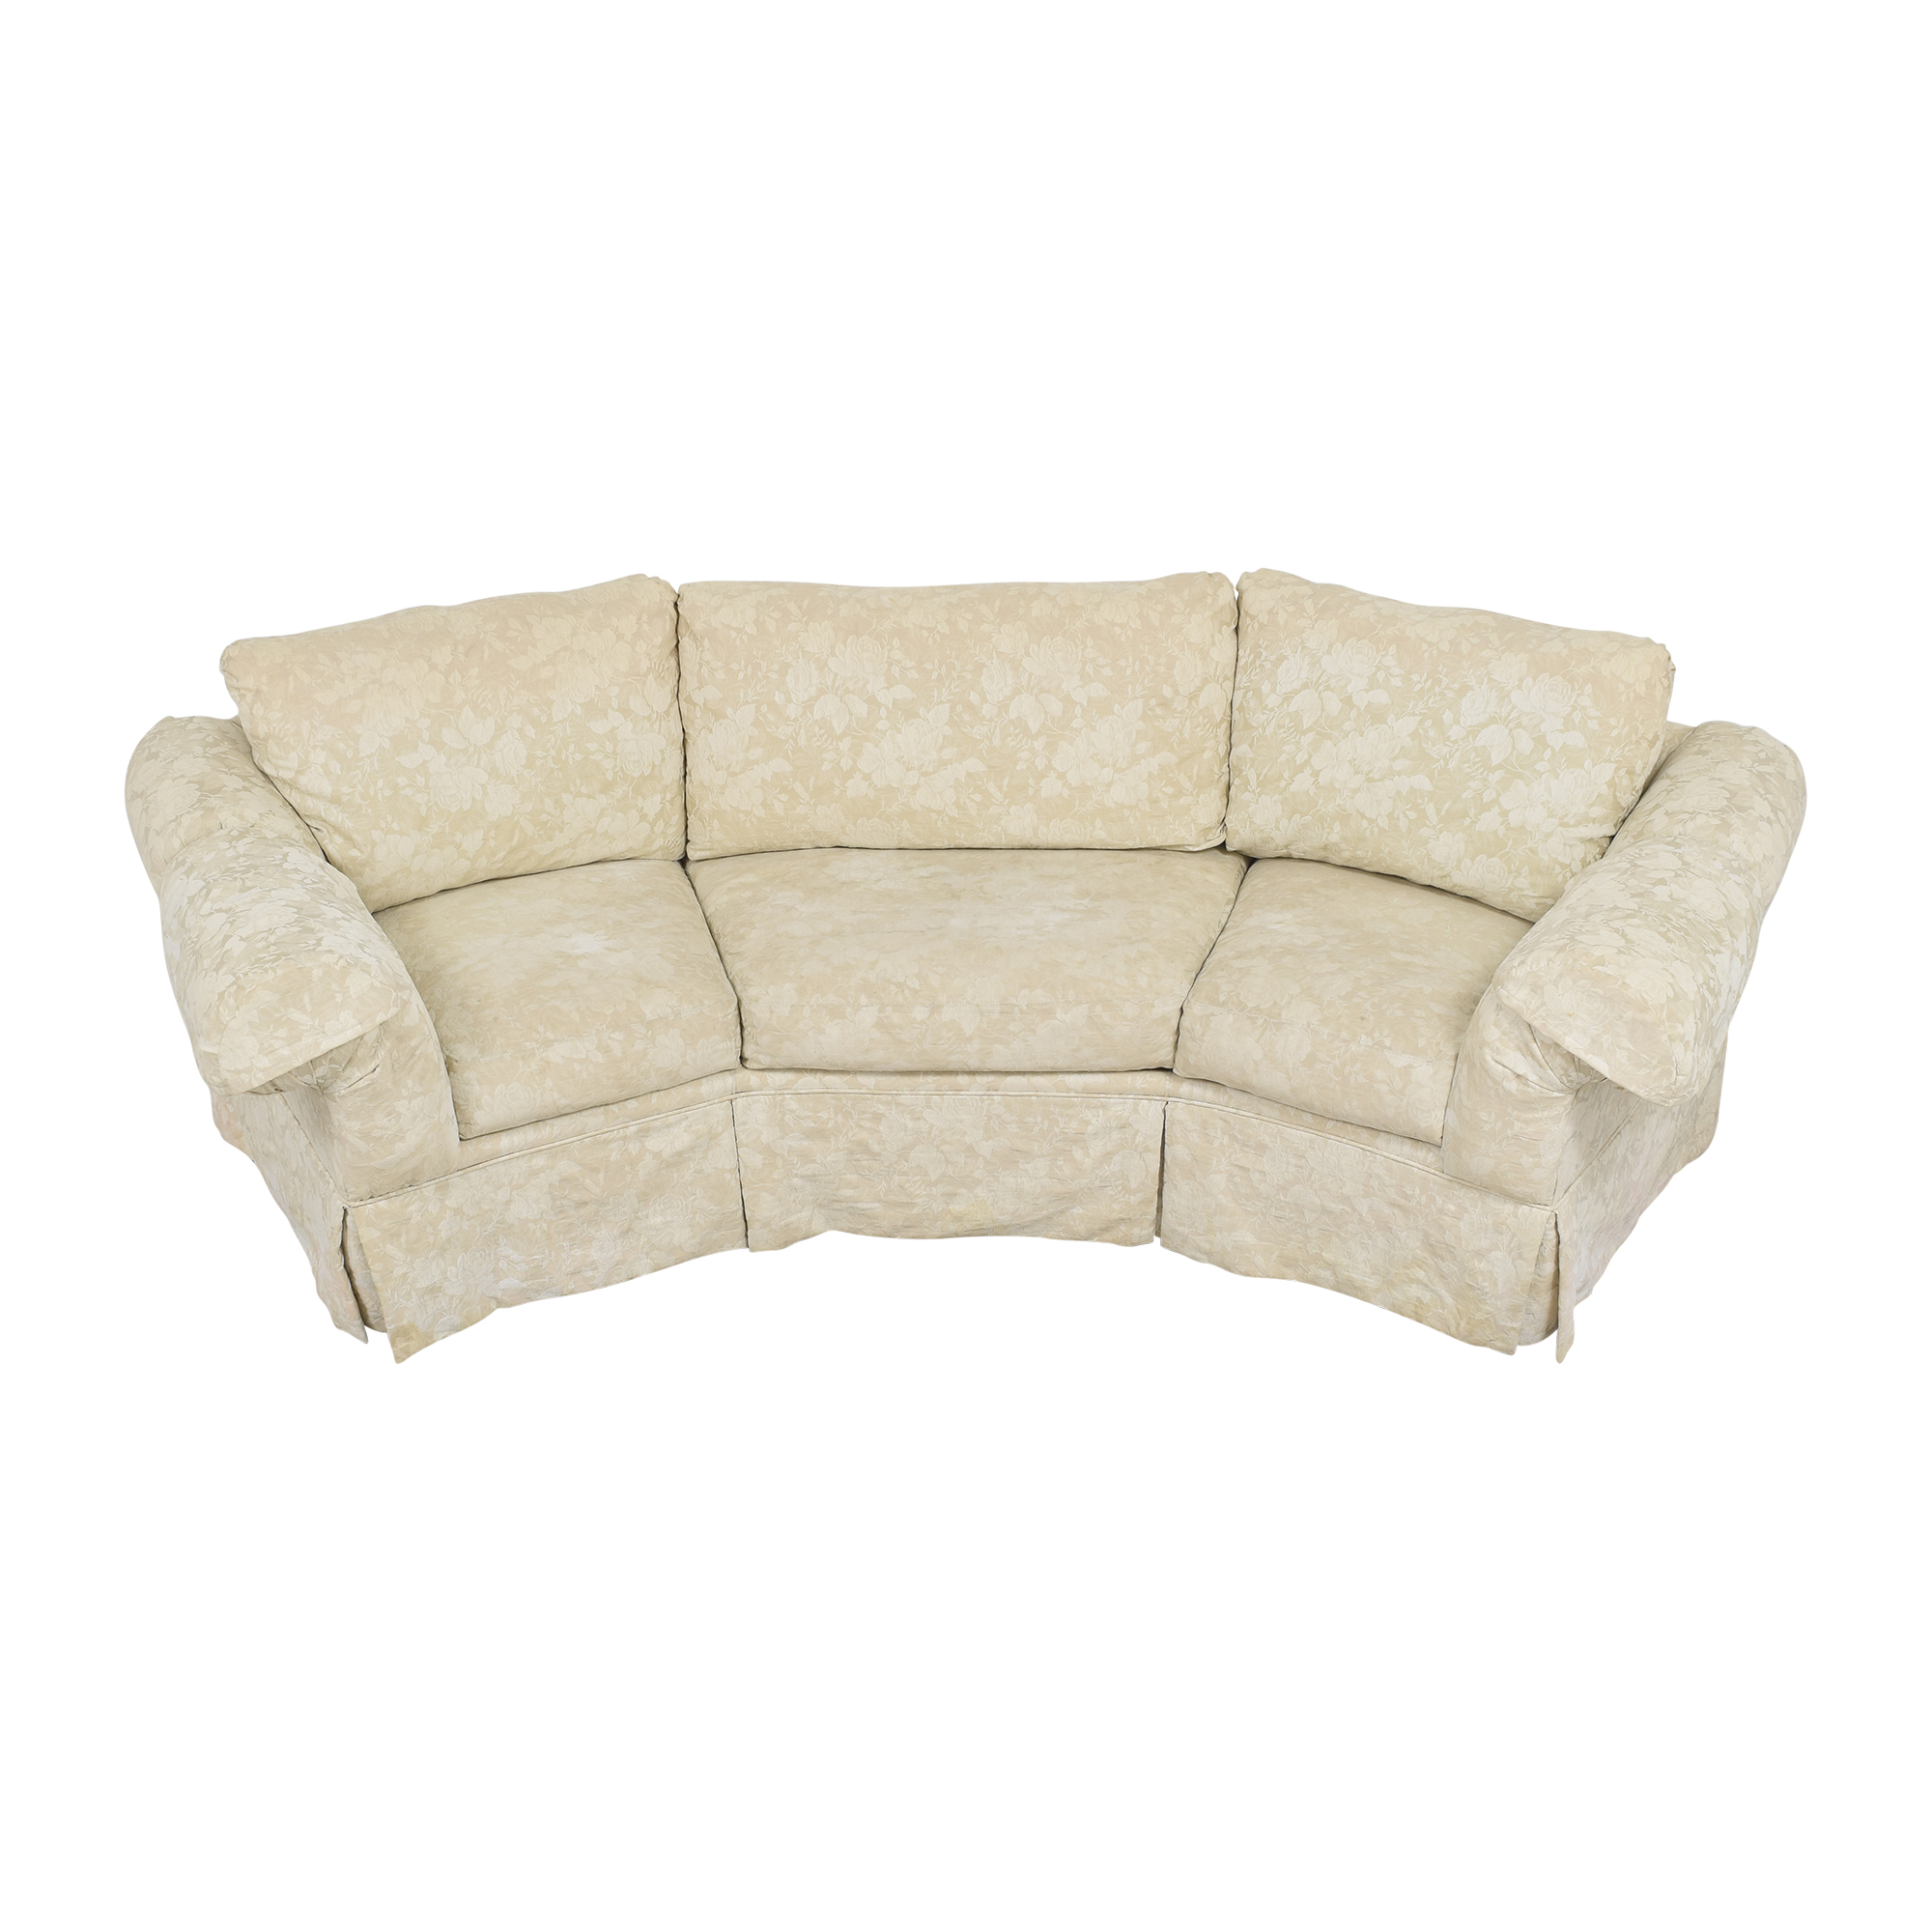 Rowe Furniture Rowe Furniture Skirted Crescent Sofa Sofas